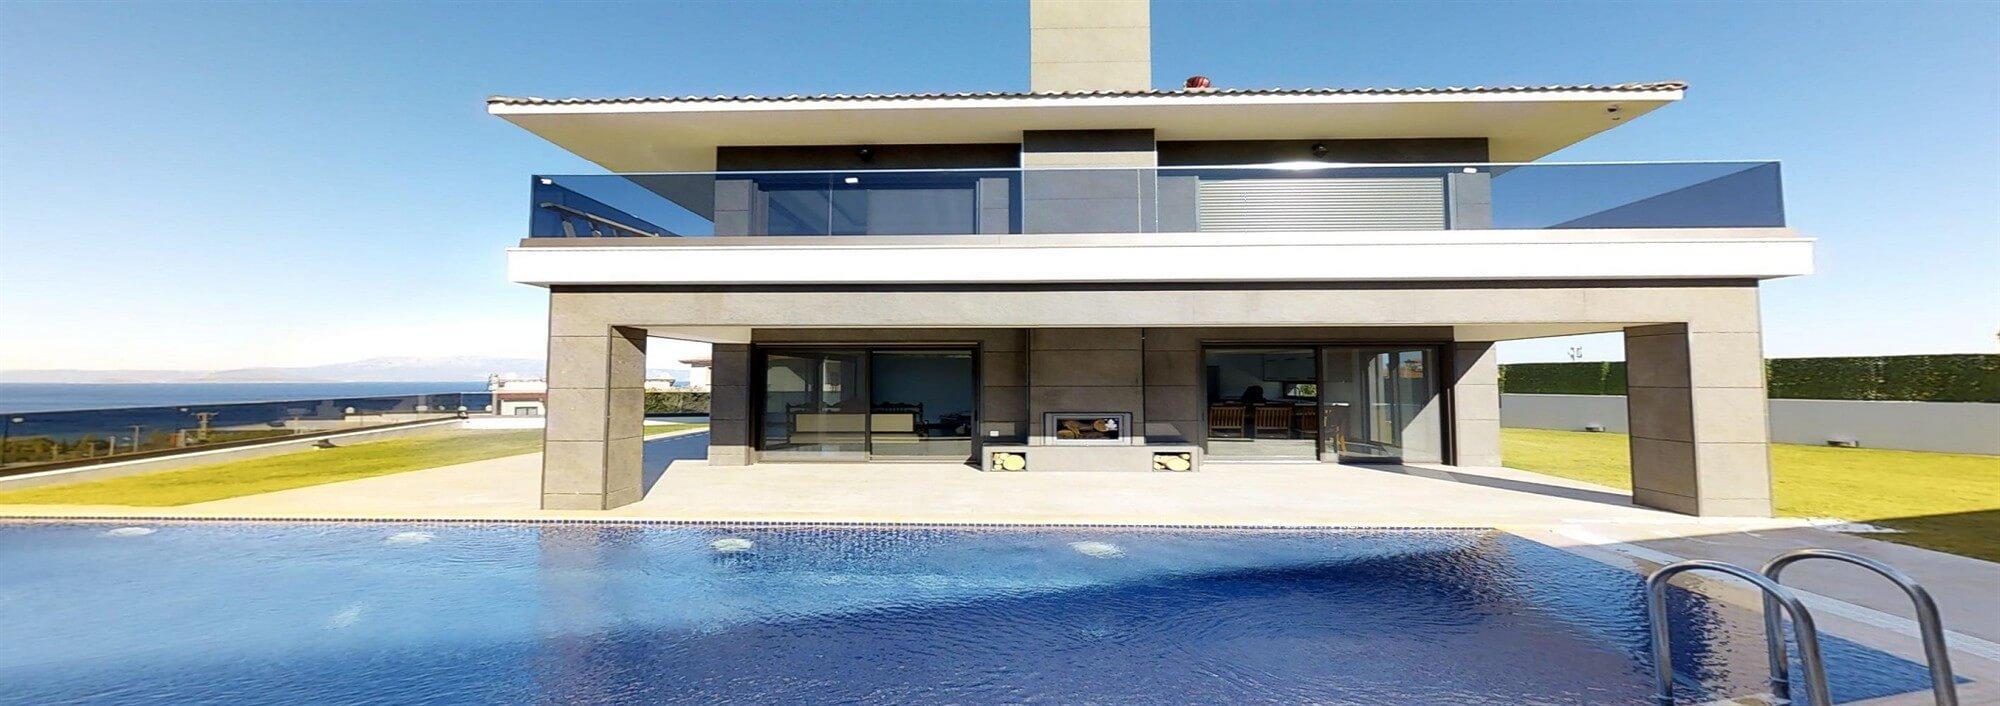 Satilik Villalar / Villas For Sale